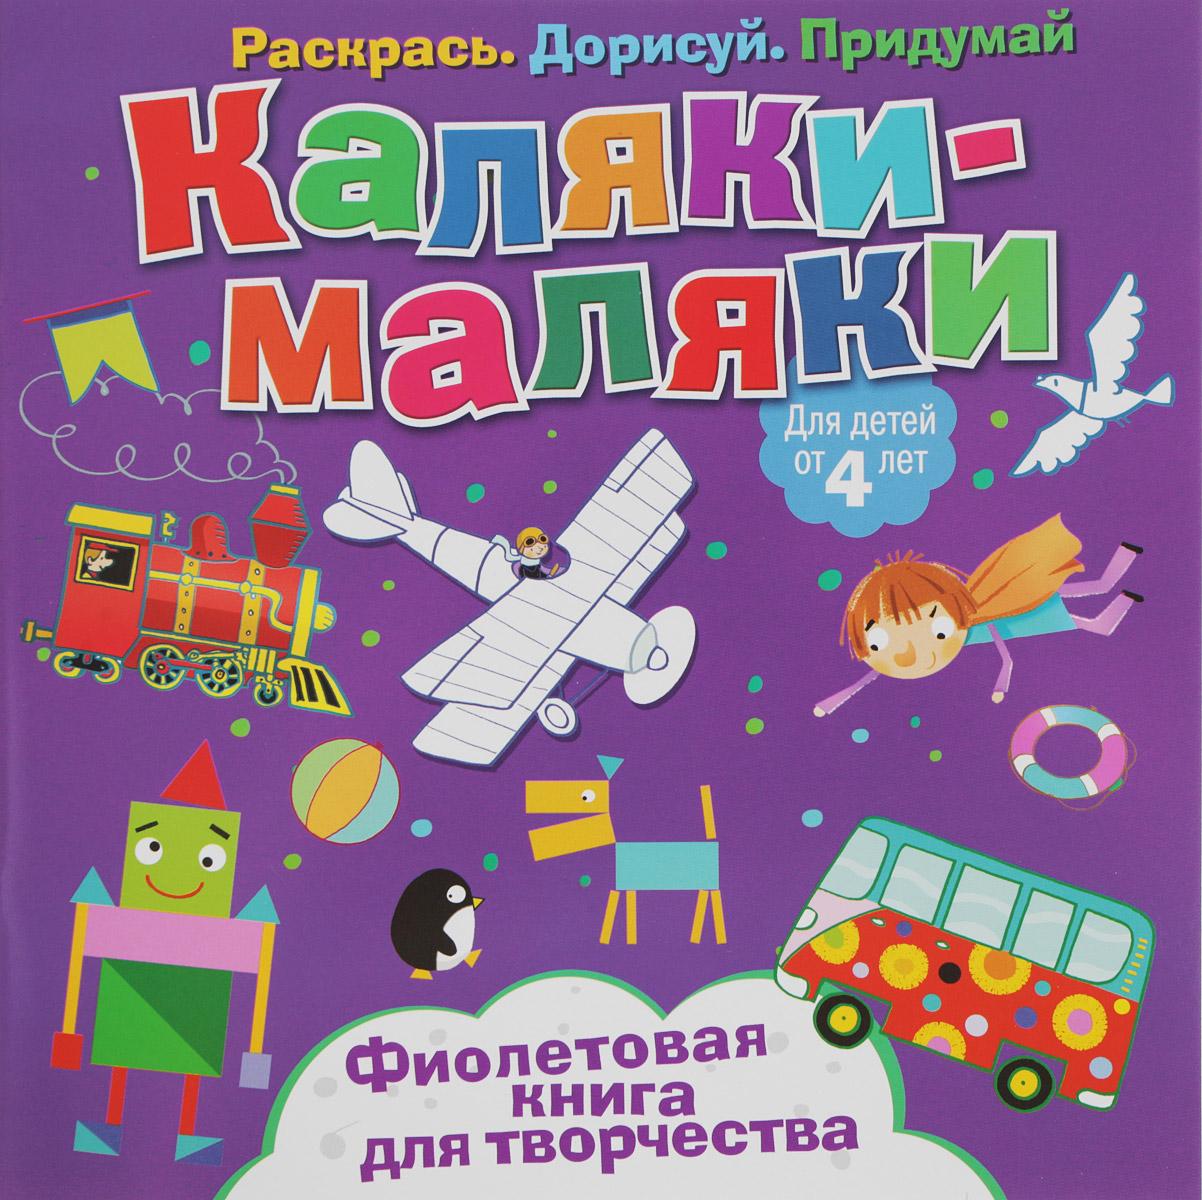 Каляки-маляки. Фиолетовая книга для творчества